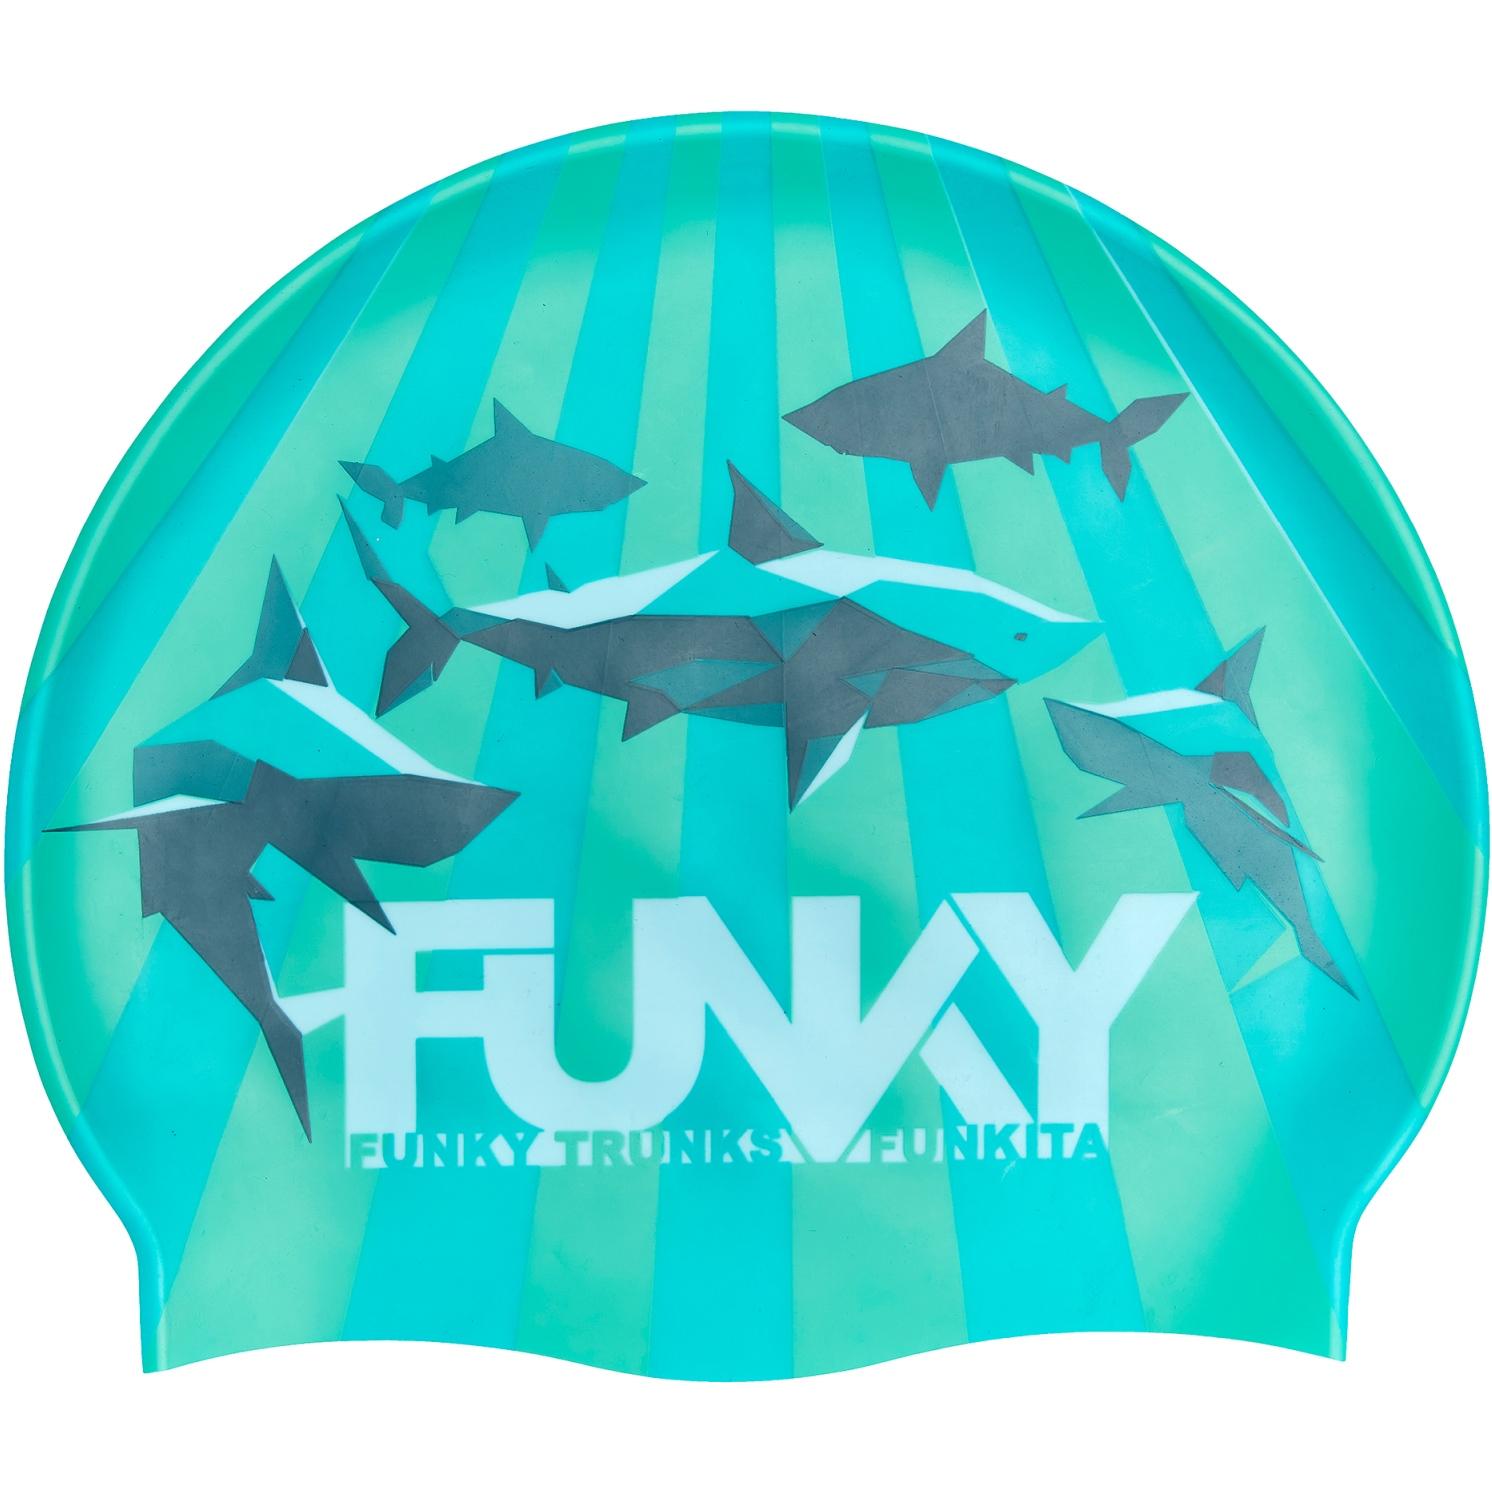 Produktbild von Funky Trunks Silikon Badekappe - Shark Bay